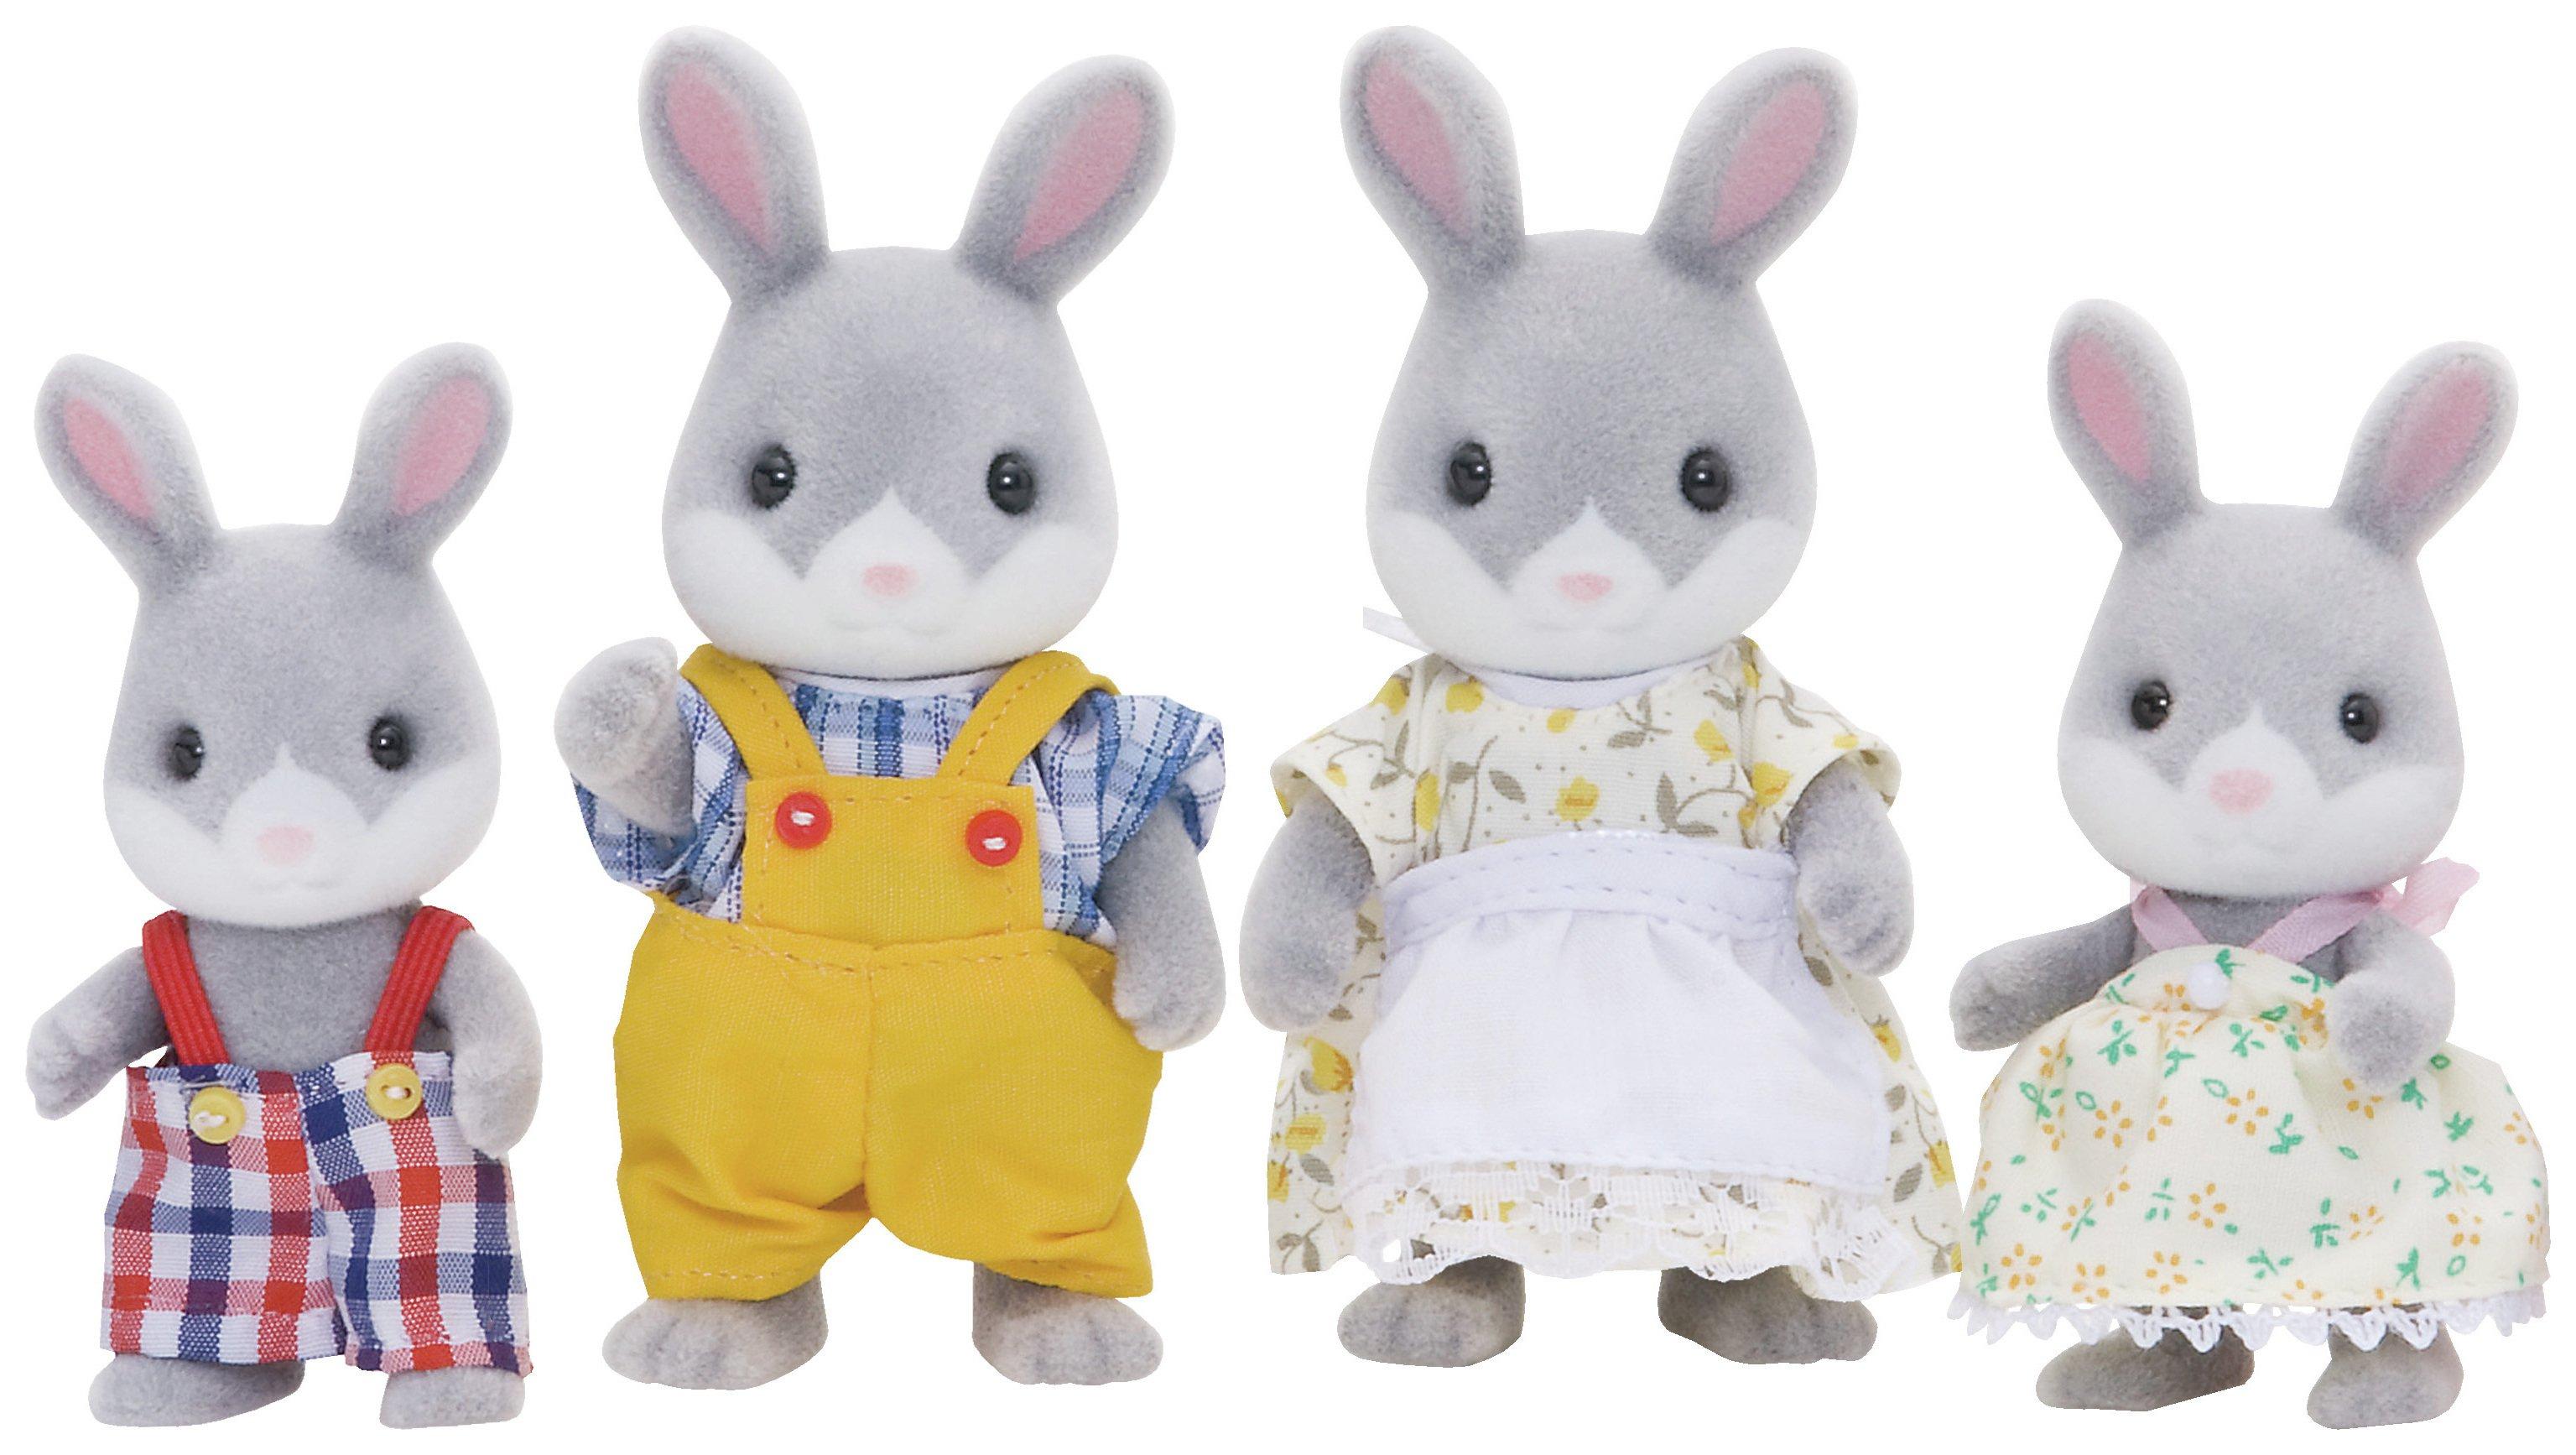 'Sylvanian Families Cottontail Rabbit Family.